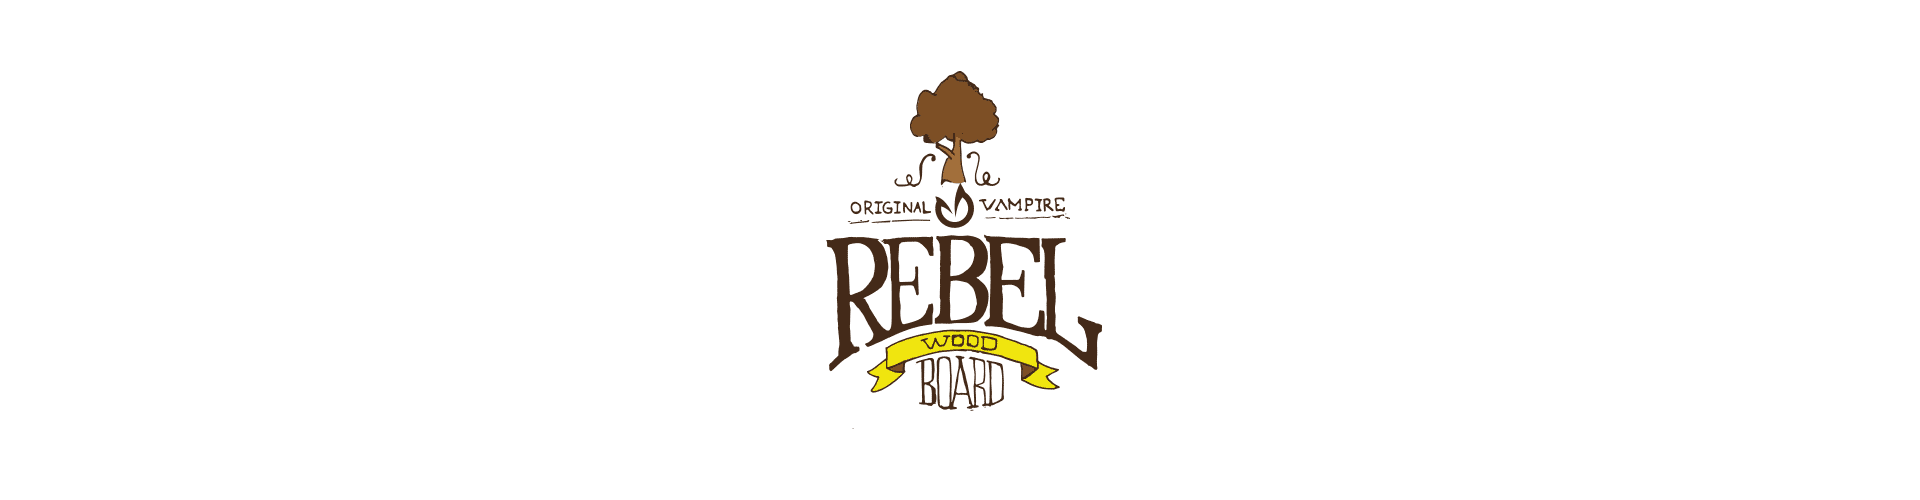 Vampire Boards - Rebel 2014 Graphic Design / Logo Design